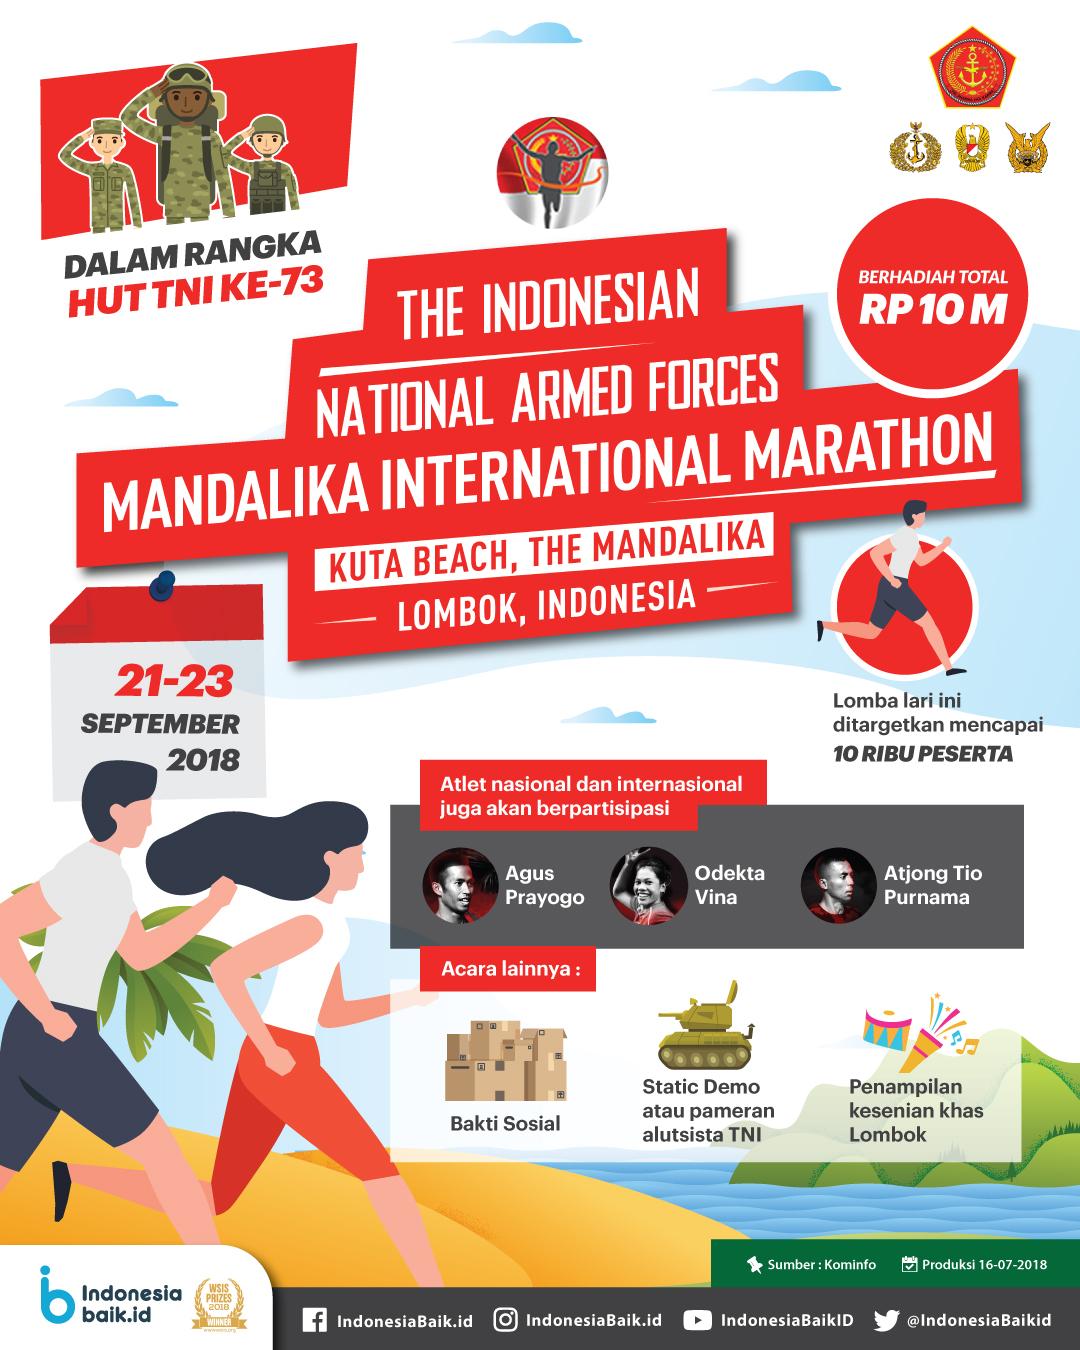 Mandalika International Marathon Berhadiah Rp 10 M